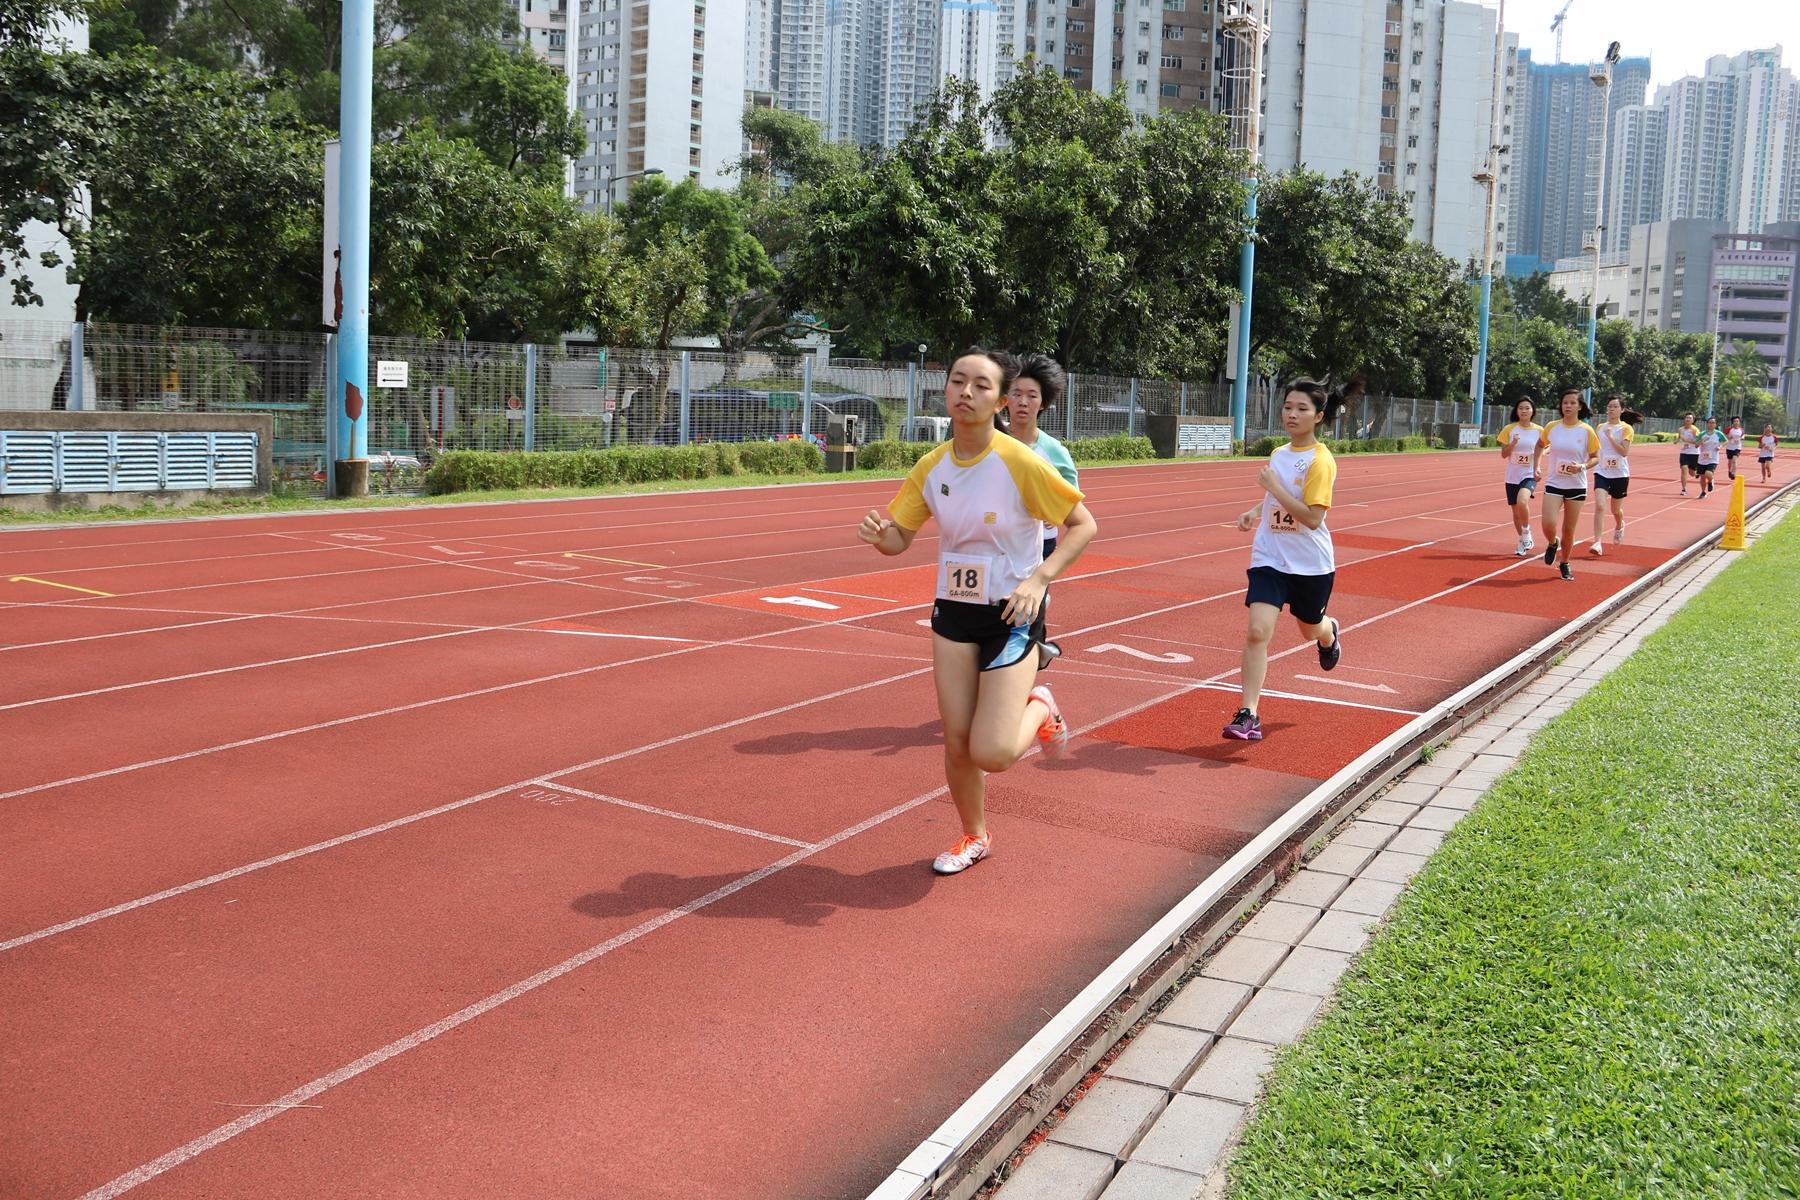 https://www.npc.edu.hk/sites/default/files/img_4758.jpg